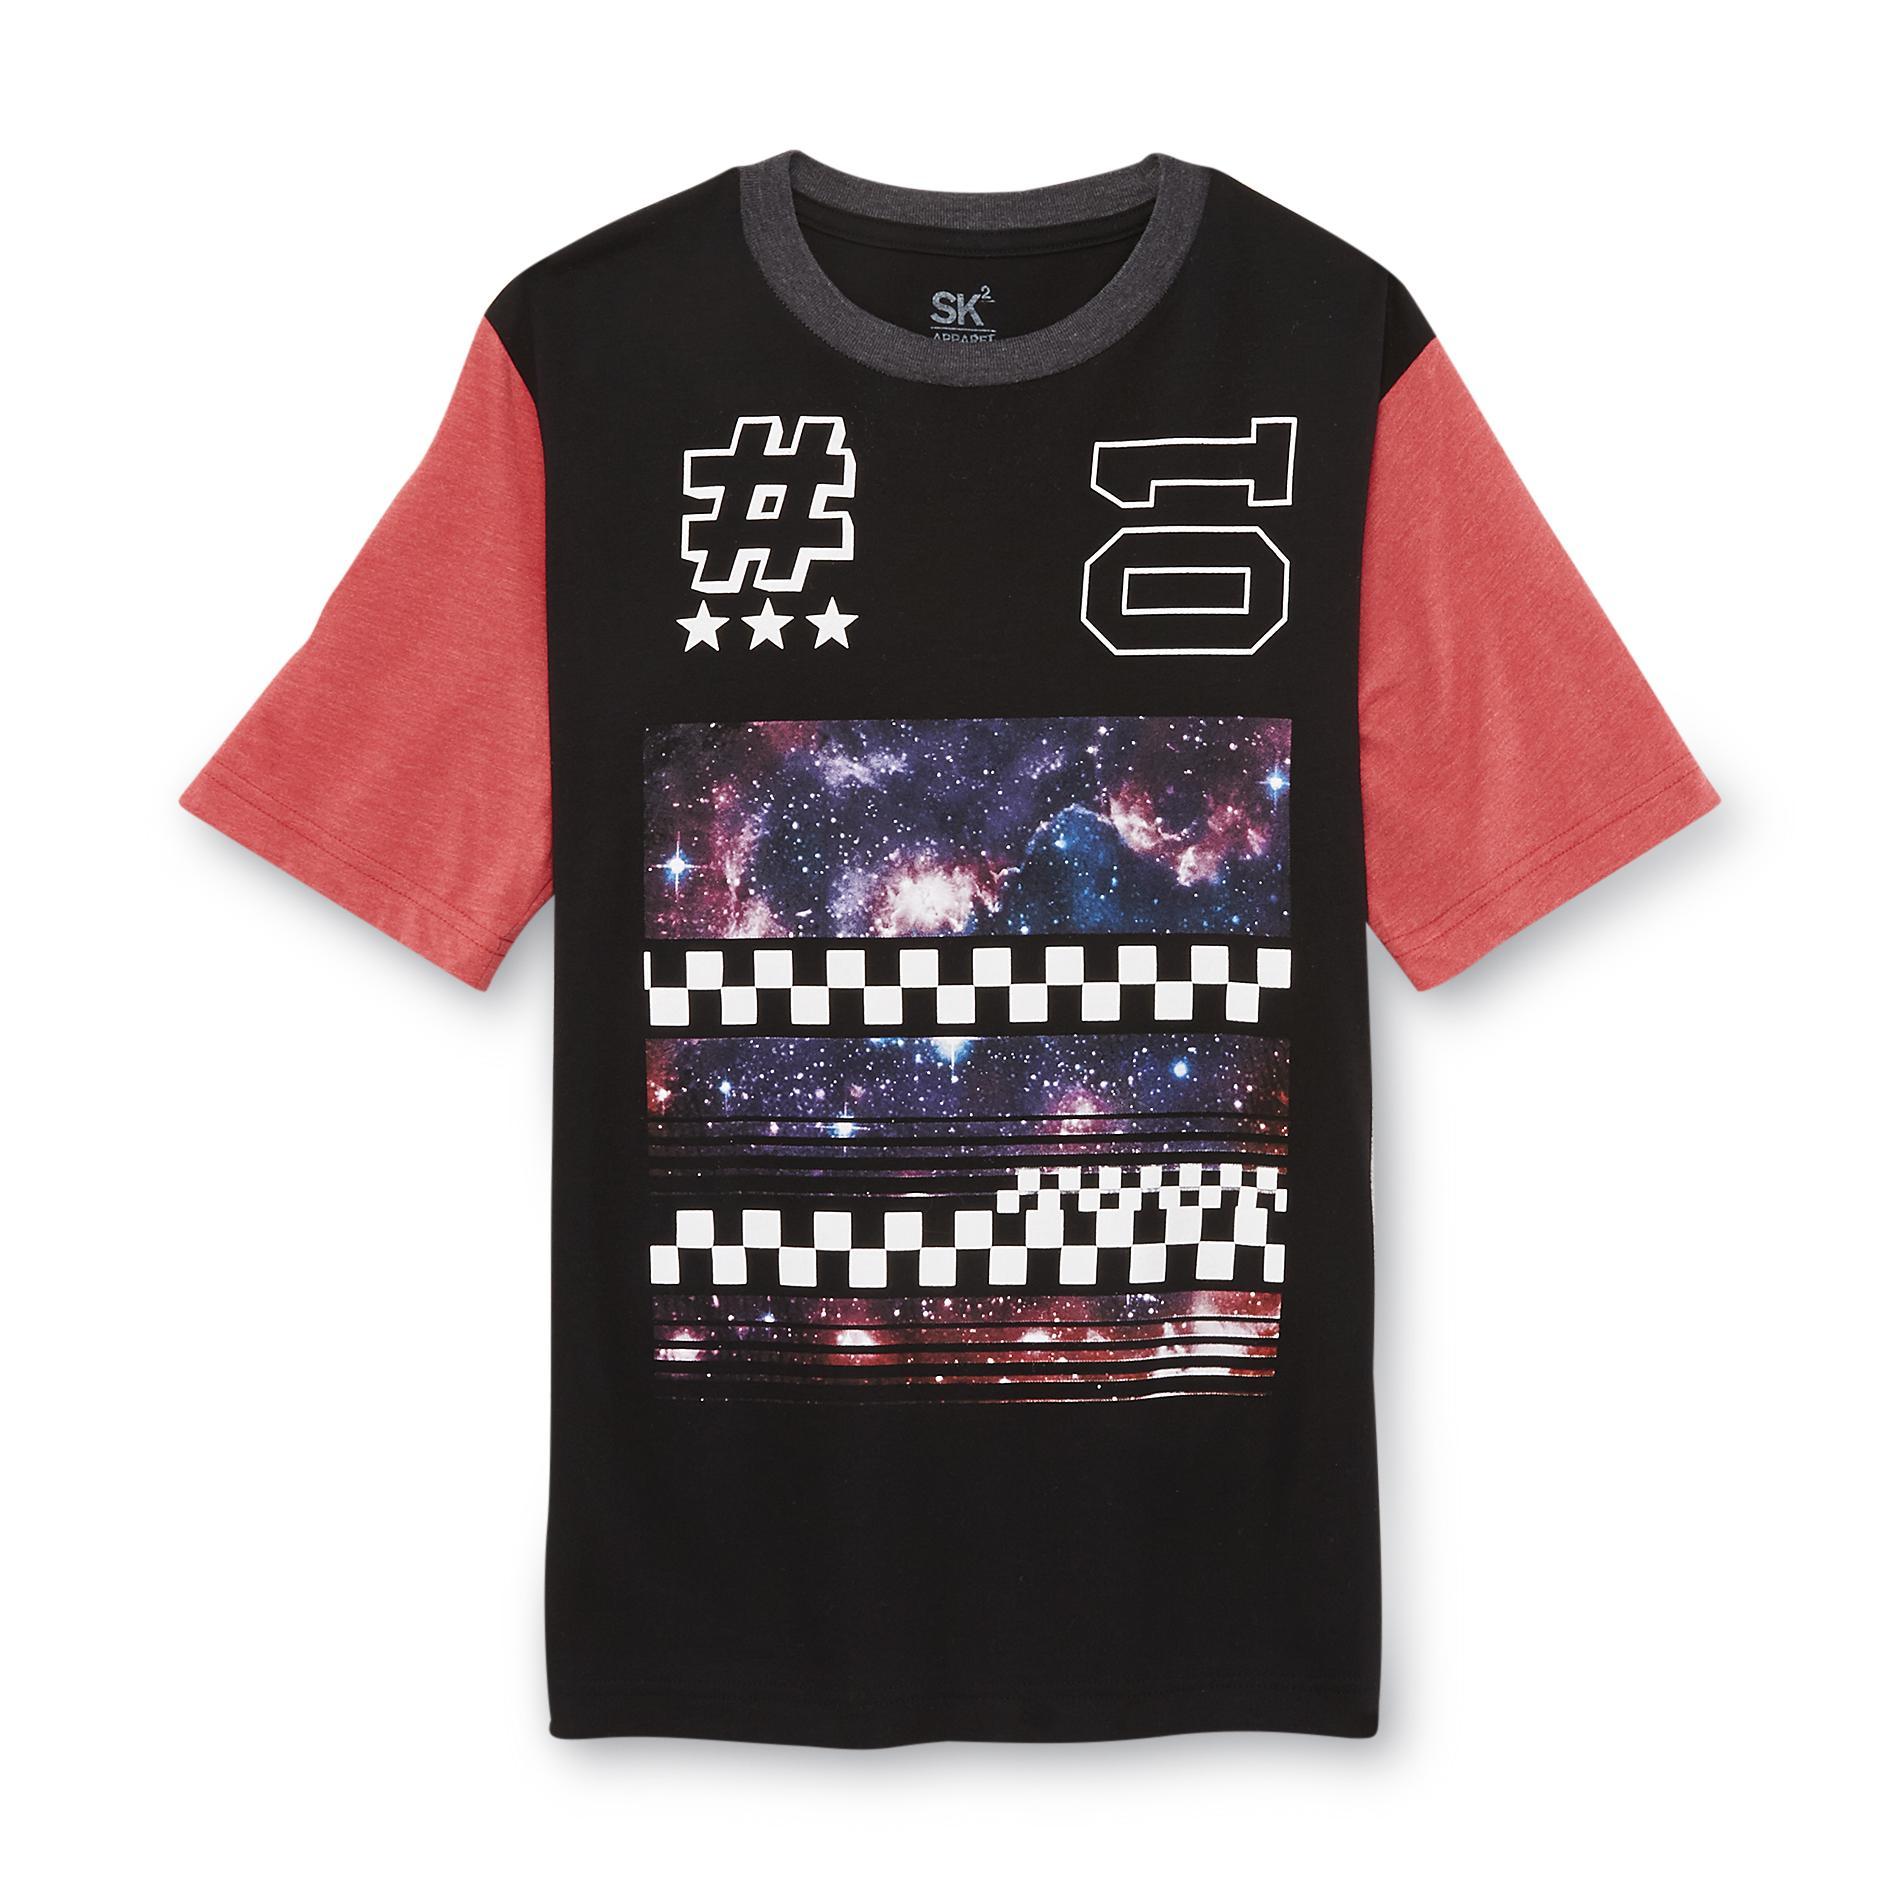 SK2 Boy's Graphic T-Shirt - Space Race